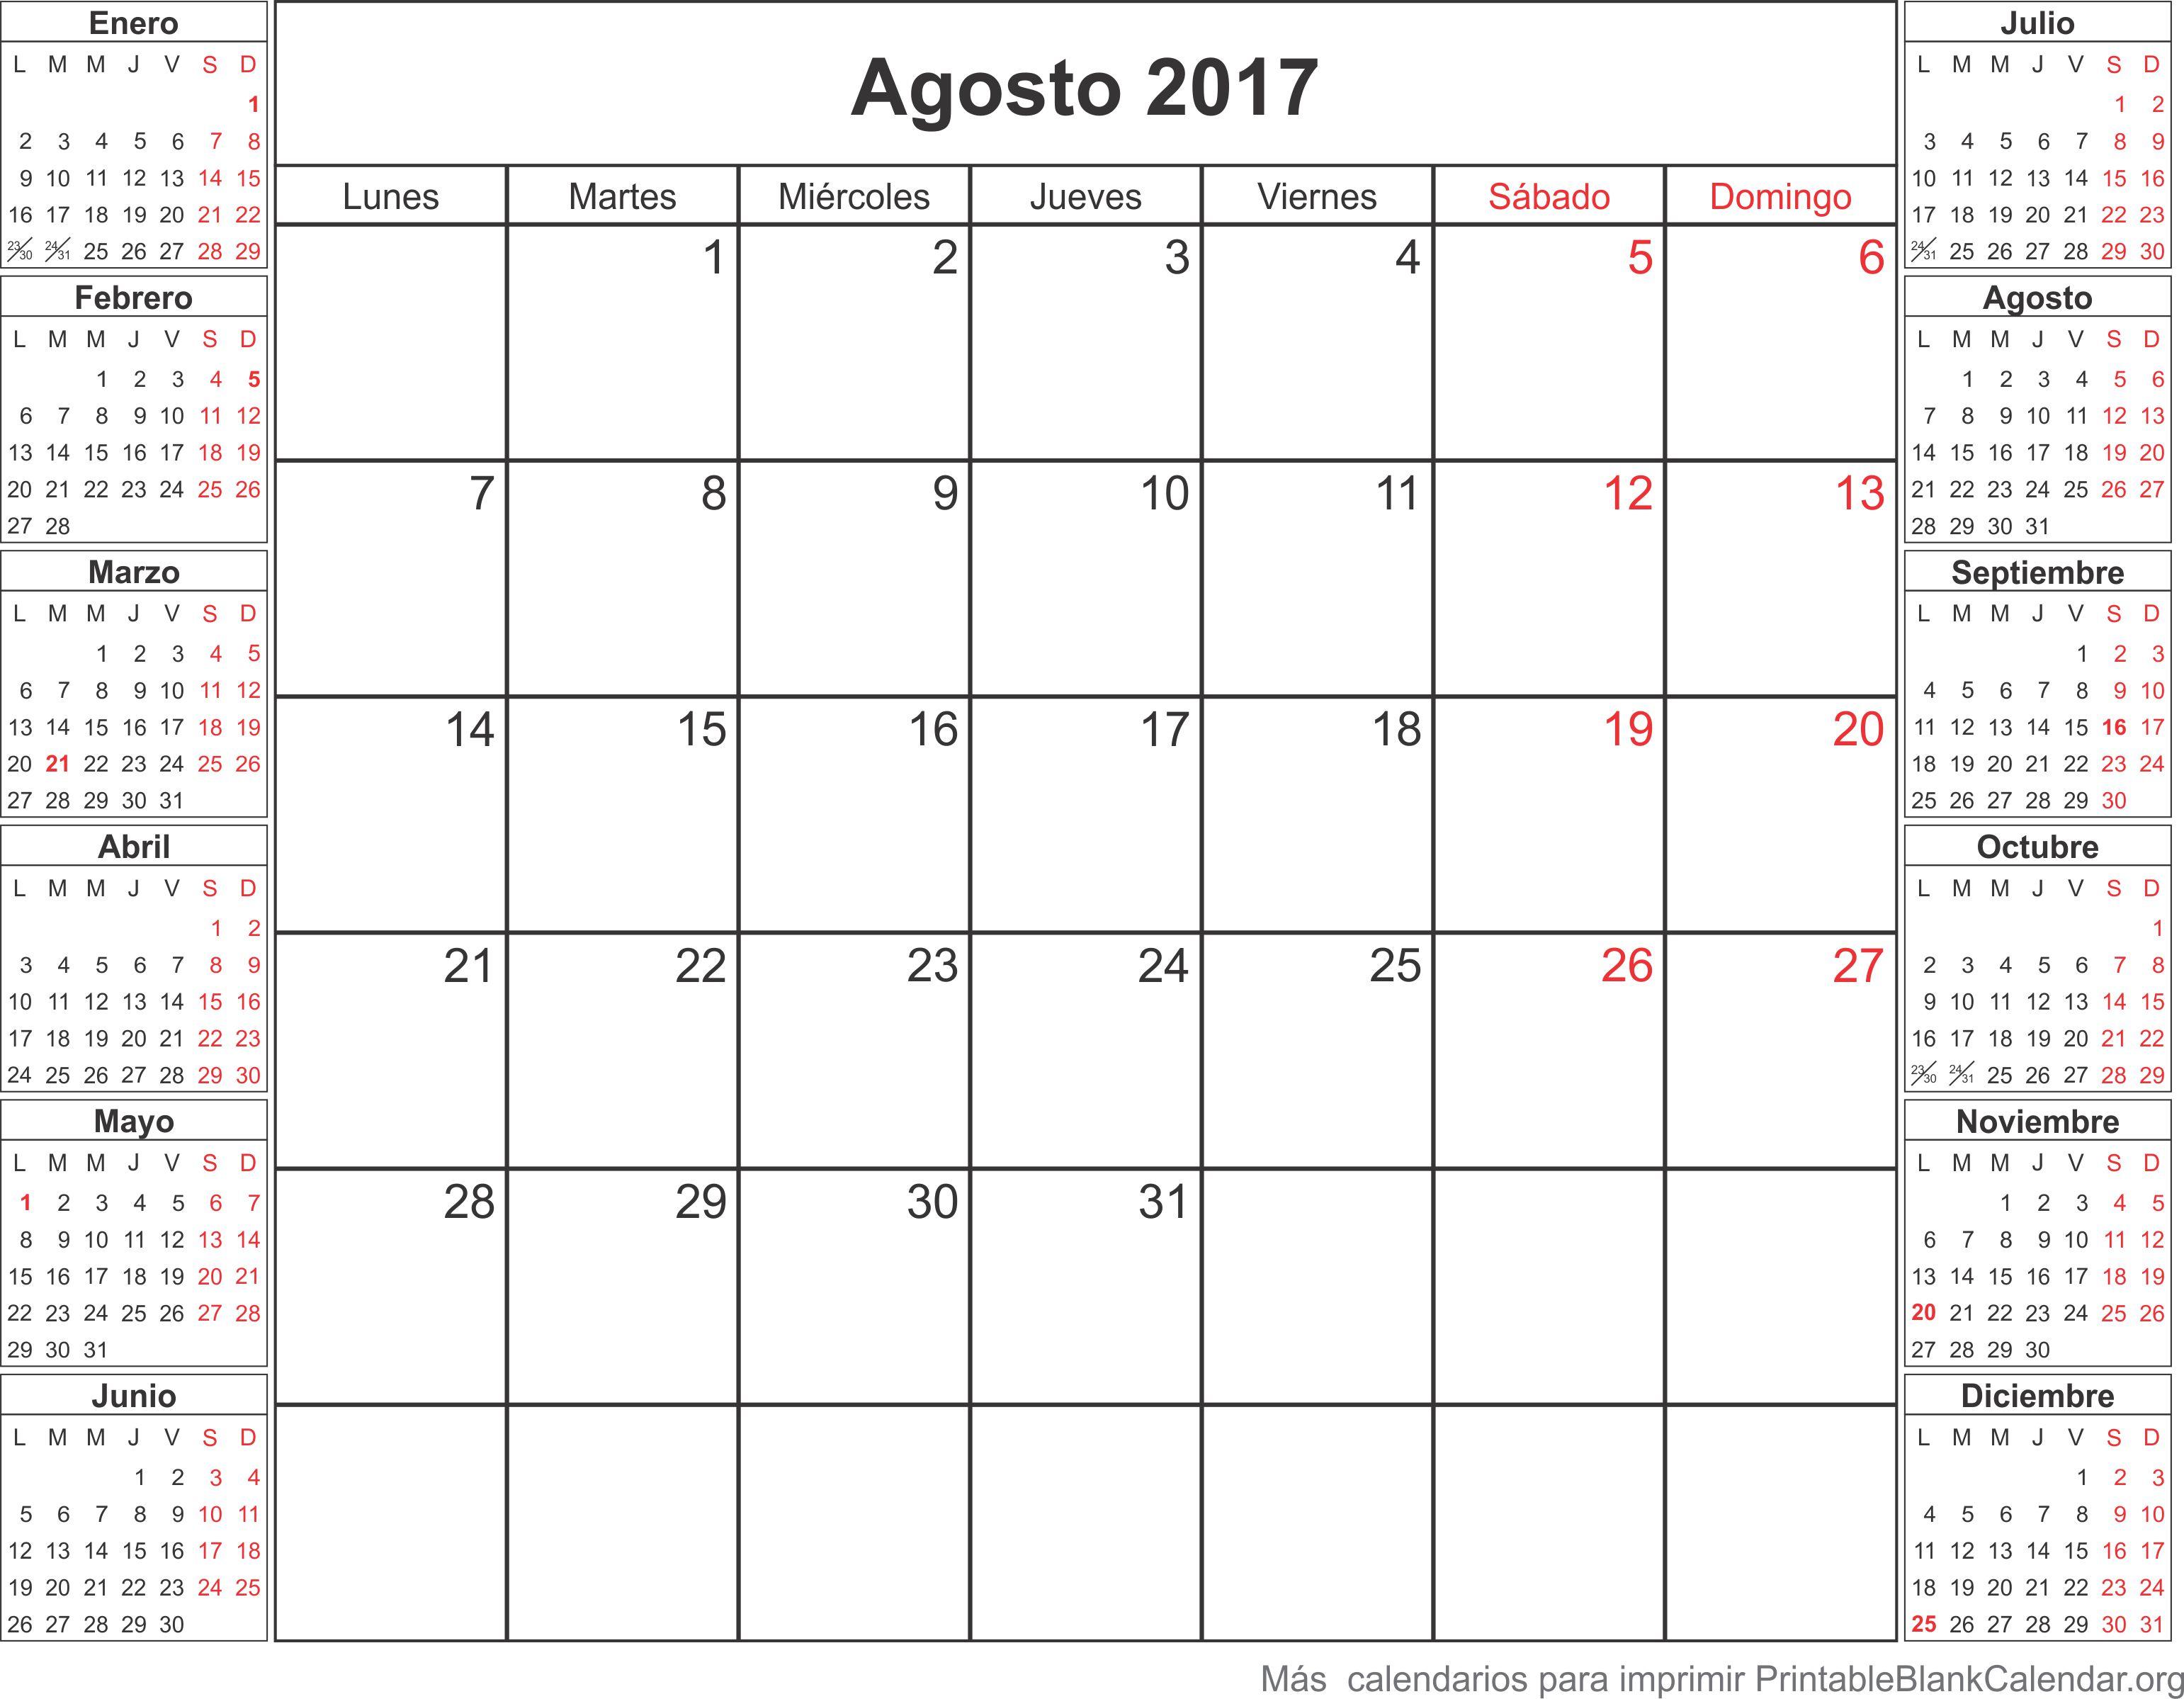 calendario ago 2017 para imprimir